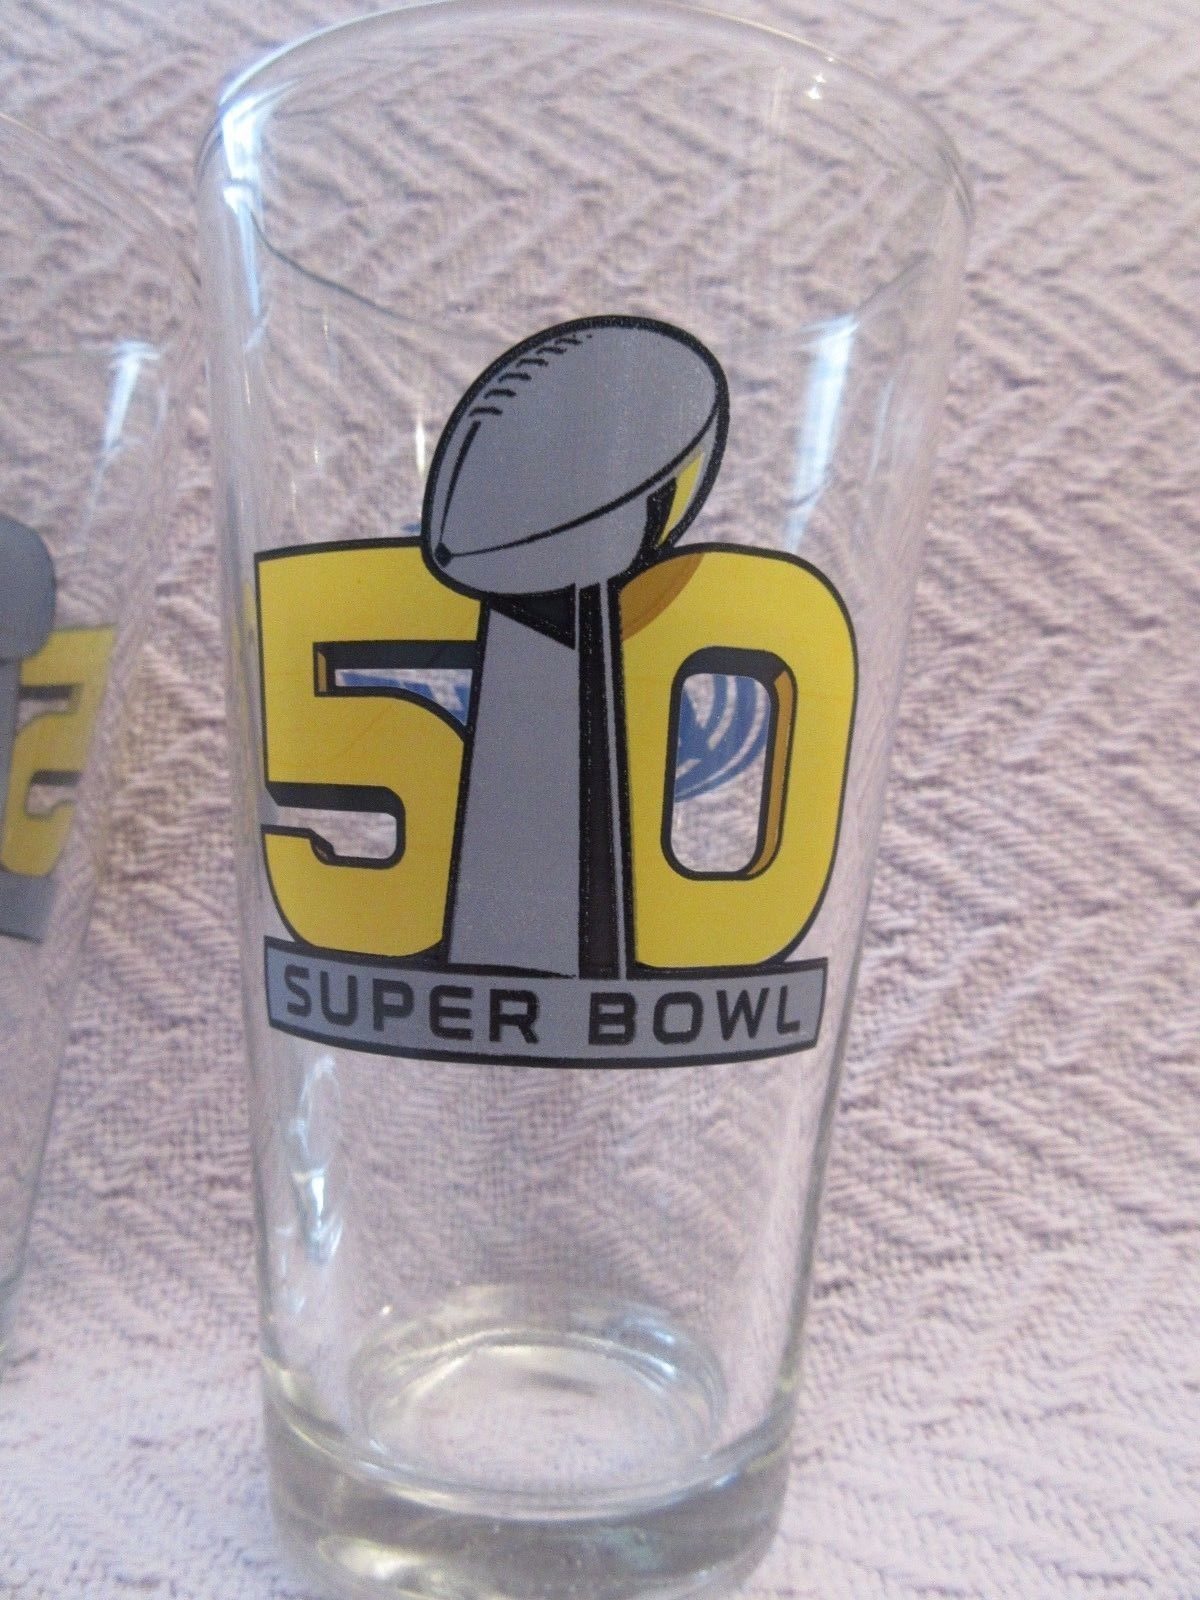 Bud Light NFL Super Bowl 50 Commemorative Pint Glasses - Set of 2 - BRAND NEW